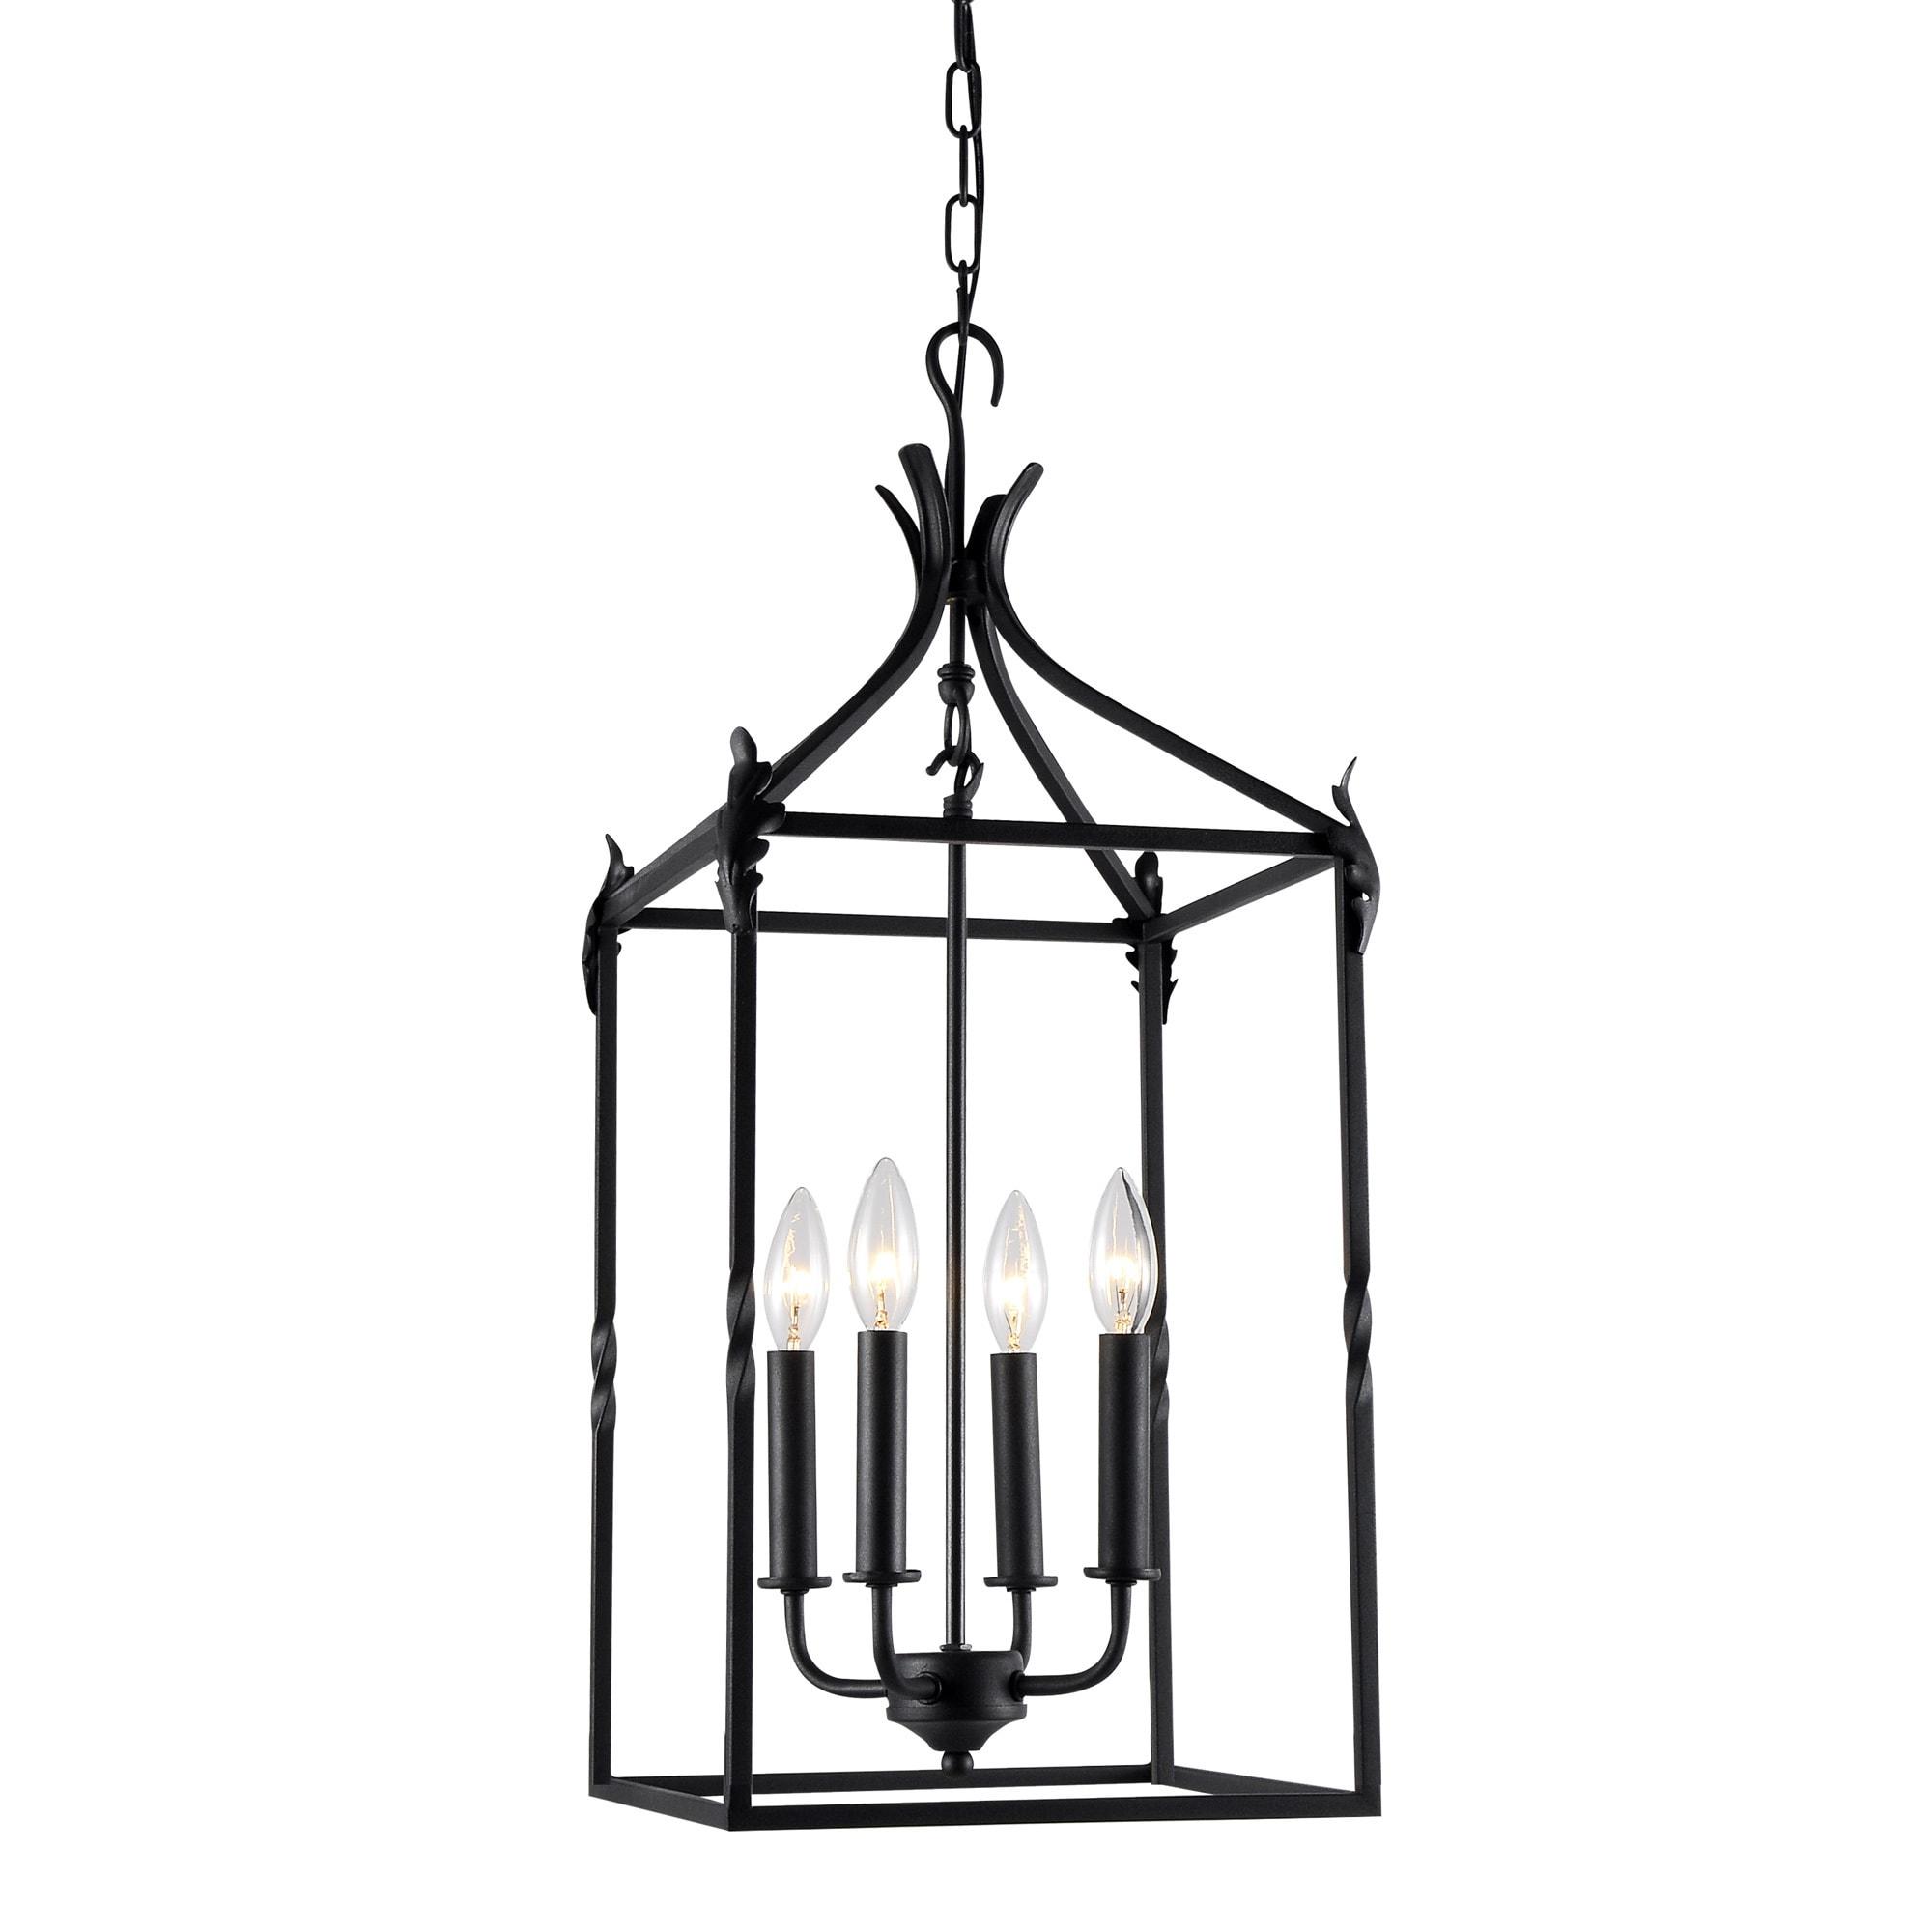 The Gray Barn Calloway Hill Iron 4 light Hanging Lantern Free